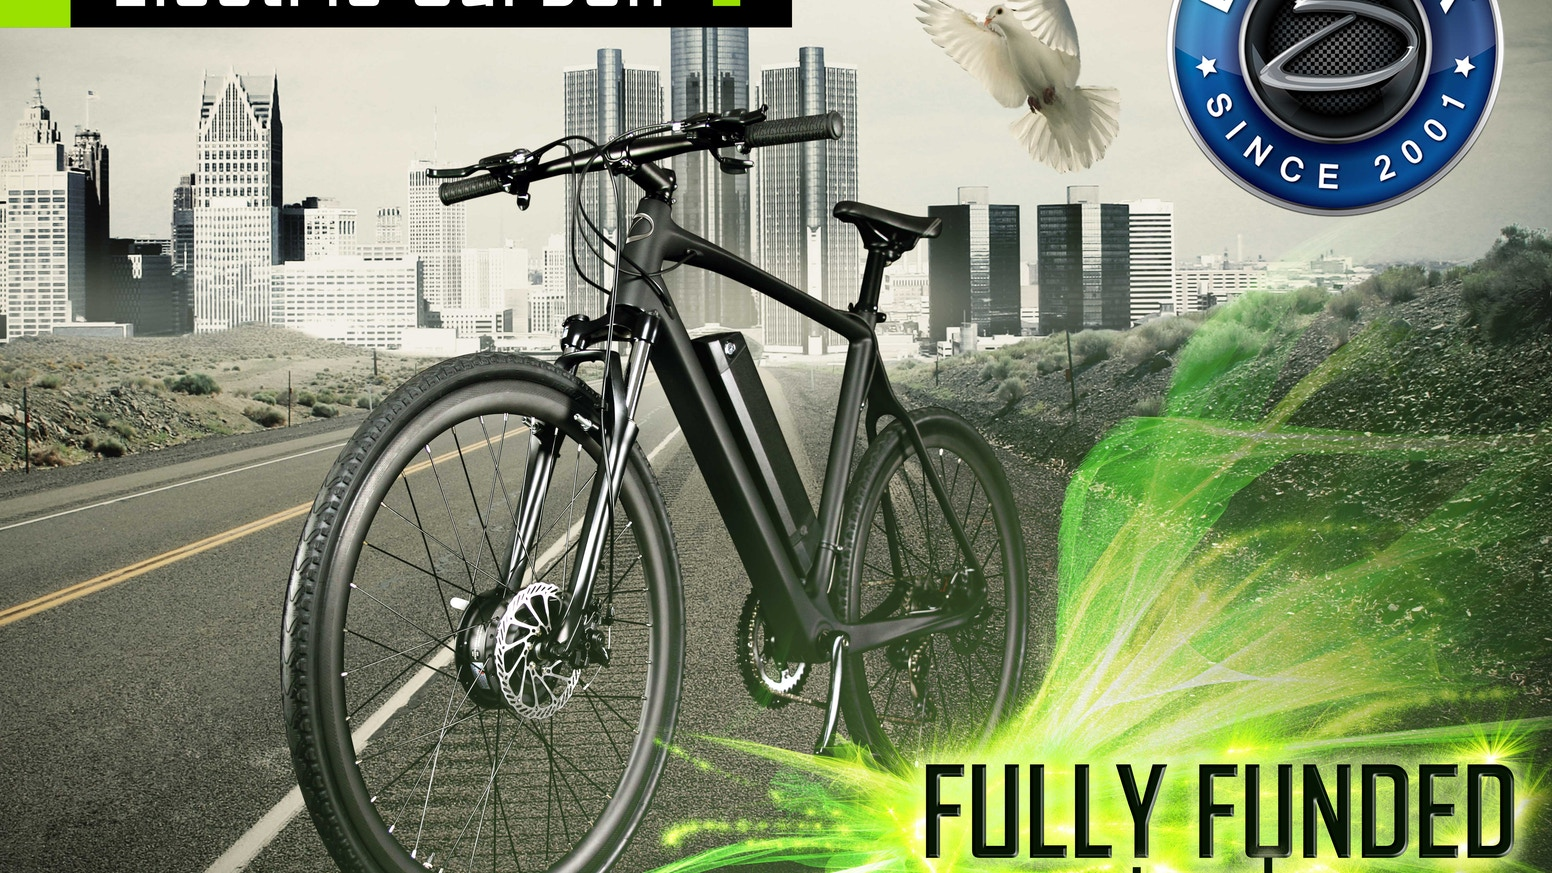 Daymak EC1 ebike - Carbon Fiber Electric Bicycle by Daymak Inc